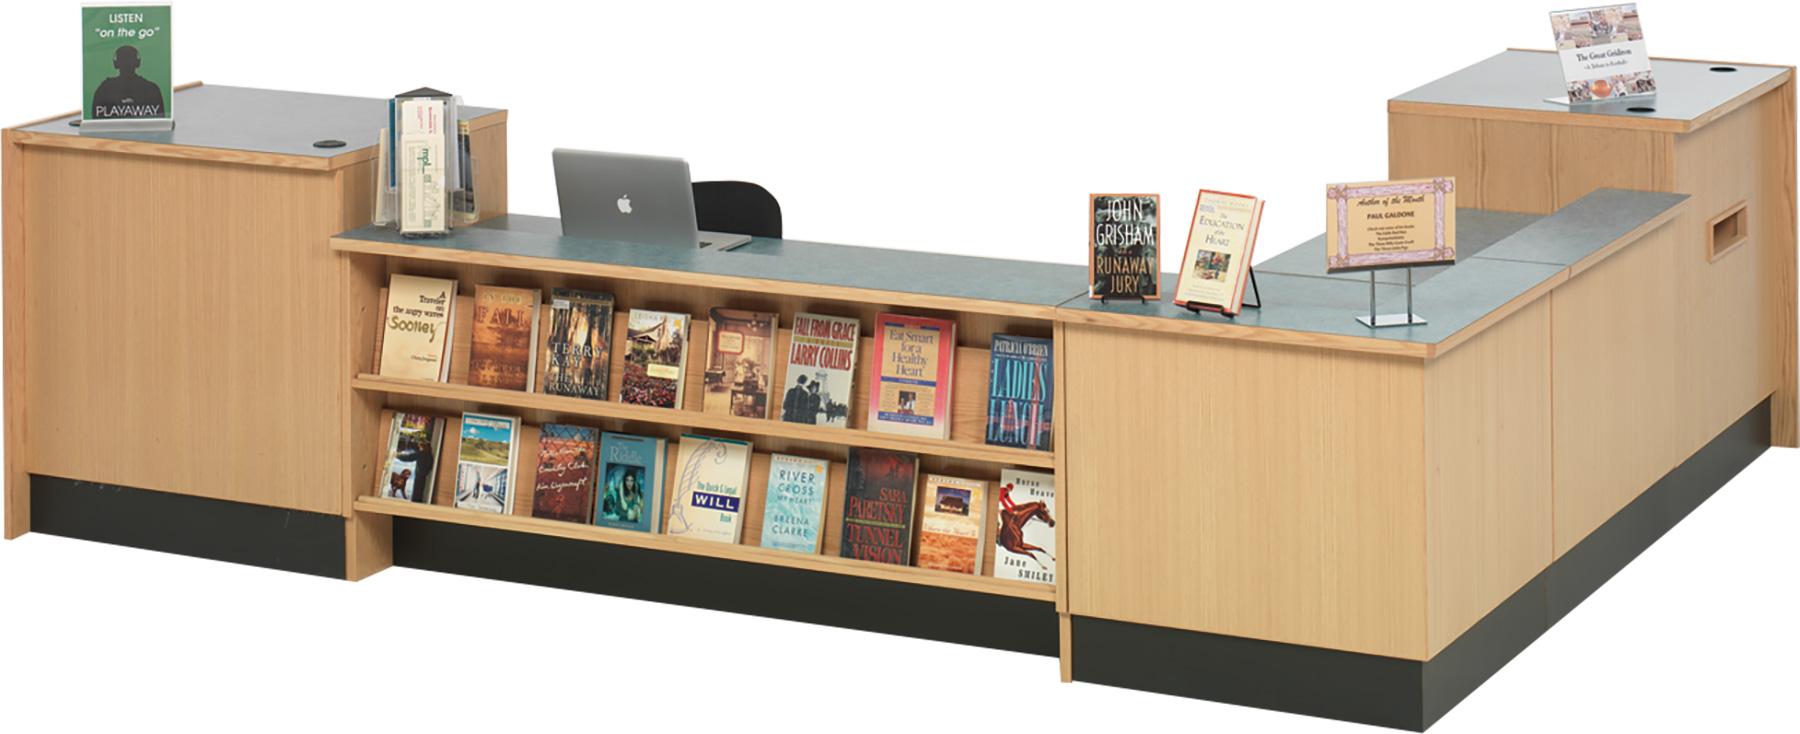 Demco® LibraCraft® Circulation Desks